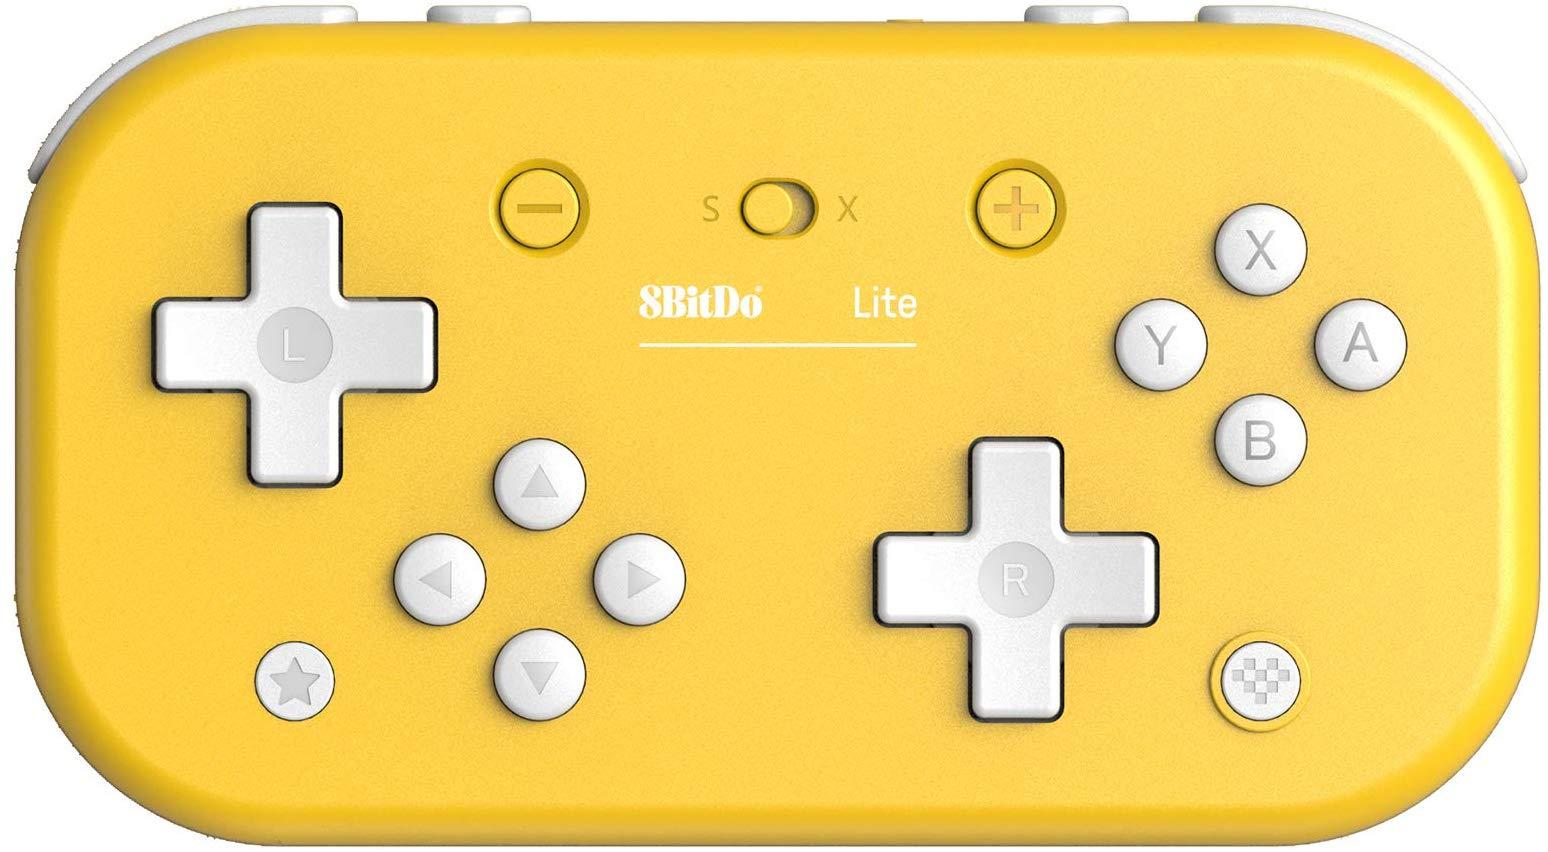 8BitDo Lite controller